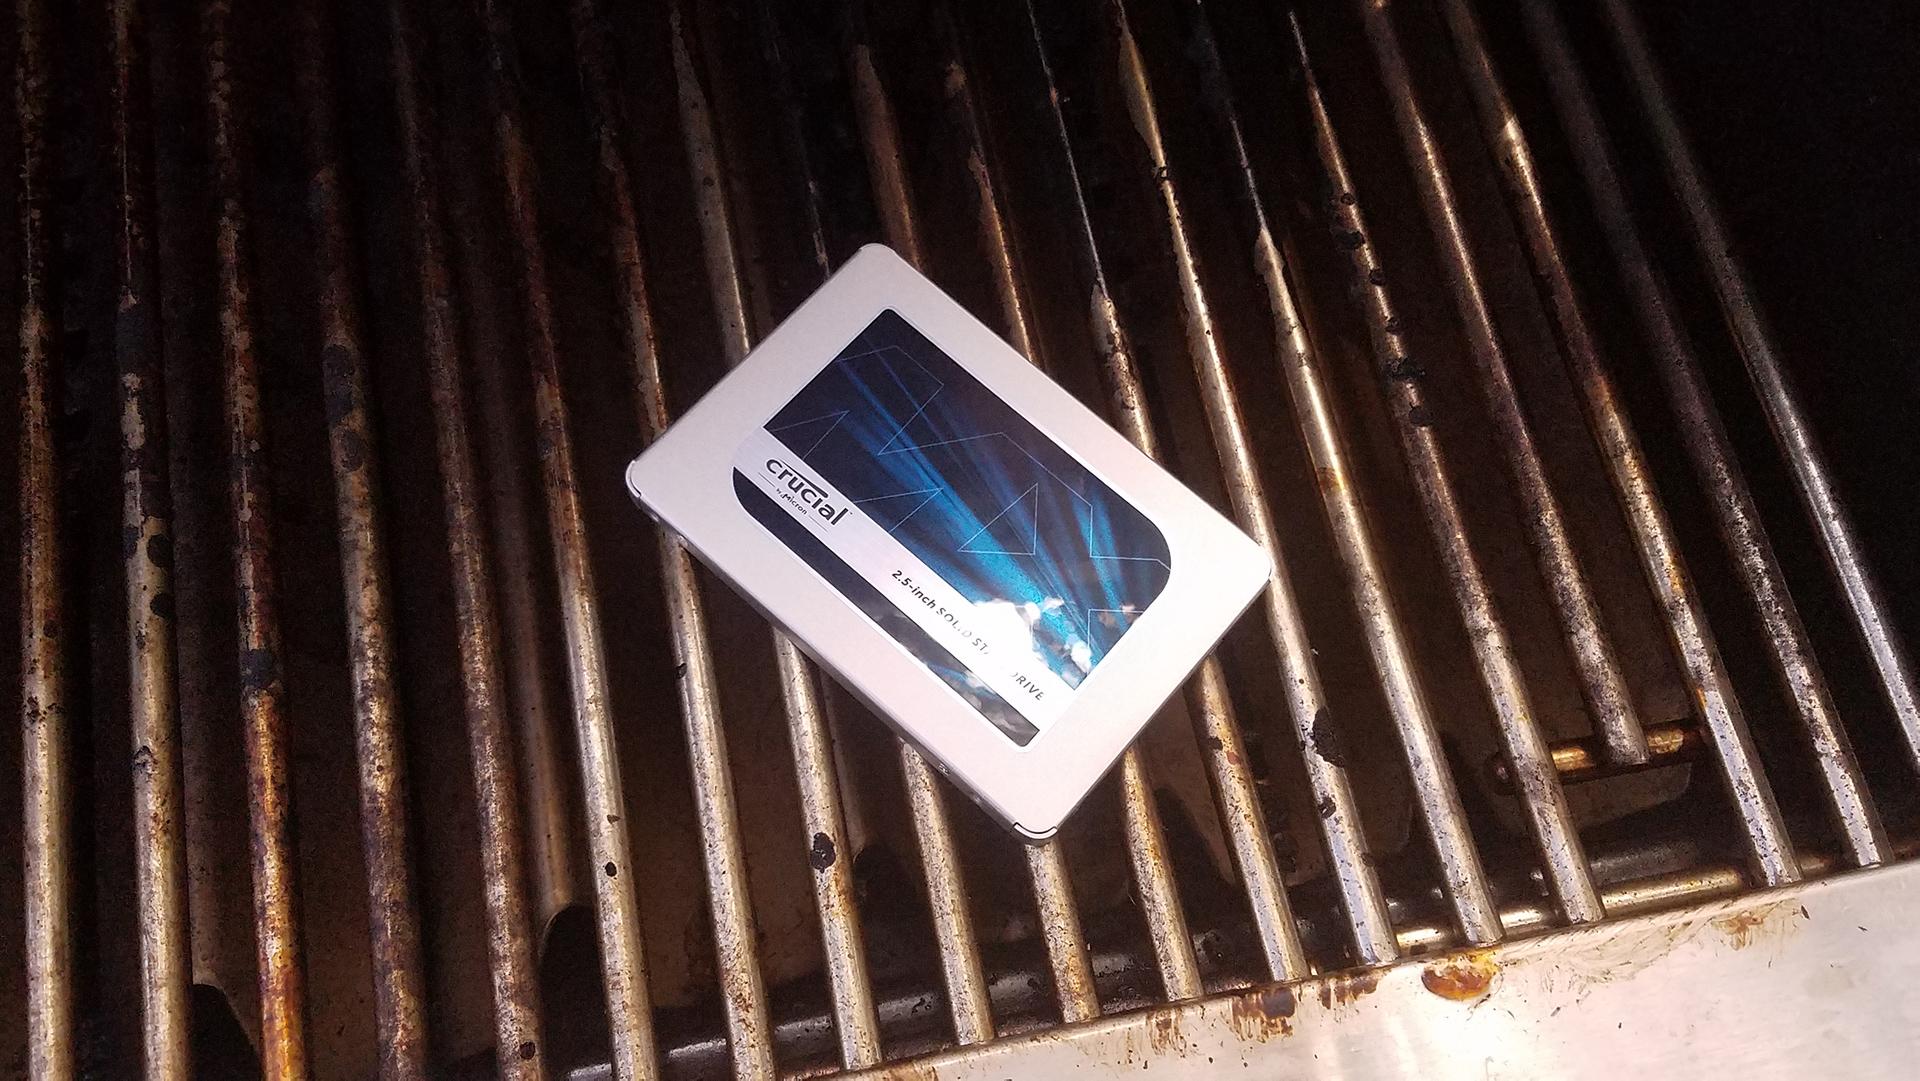 wccftech-crucial-mx500-500gb-sata-grill